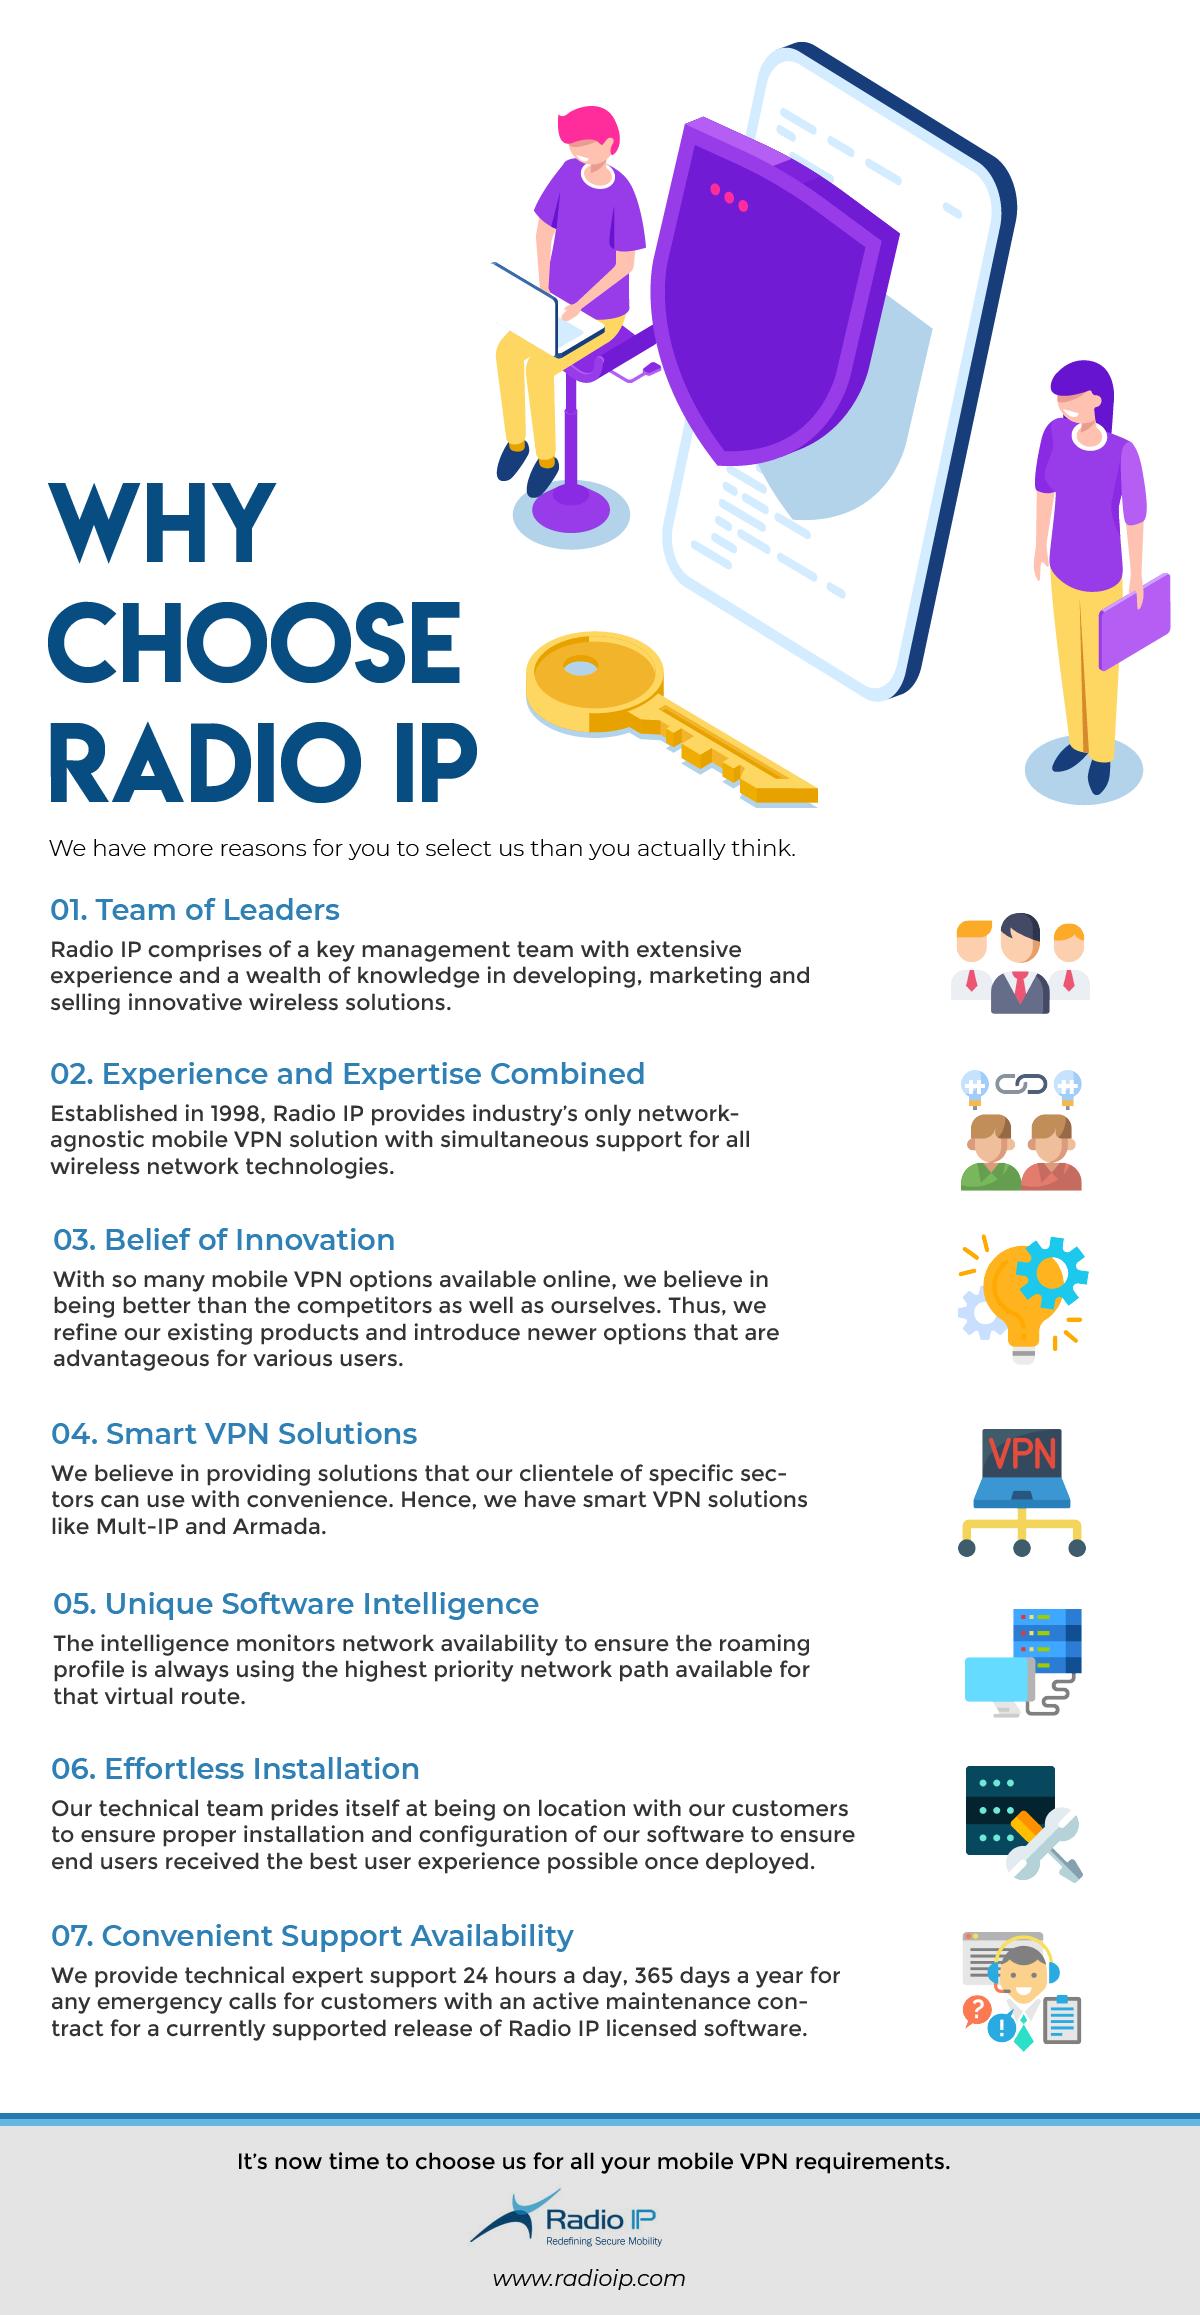 Why Choose Radio IP